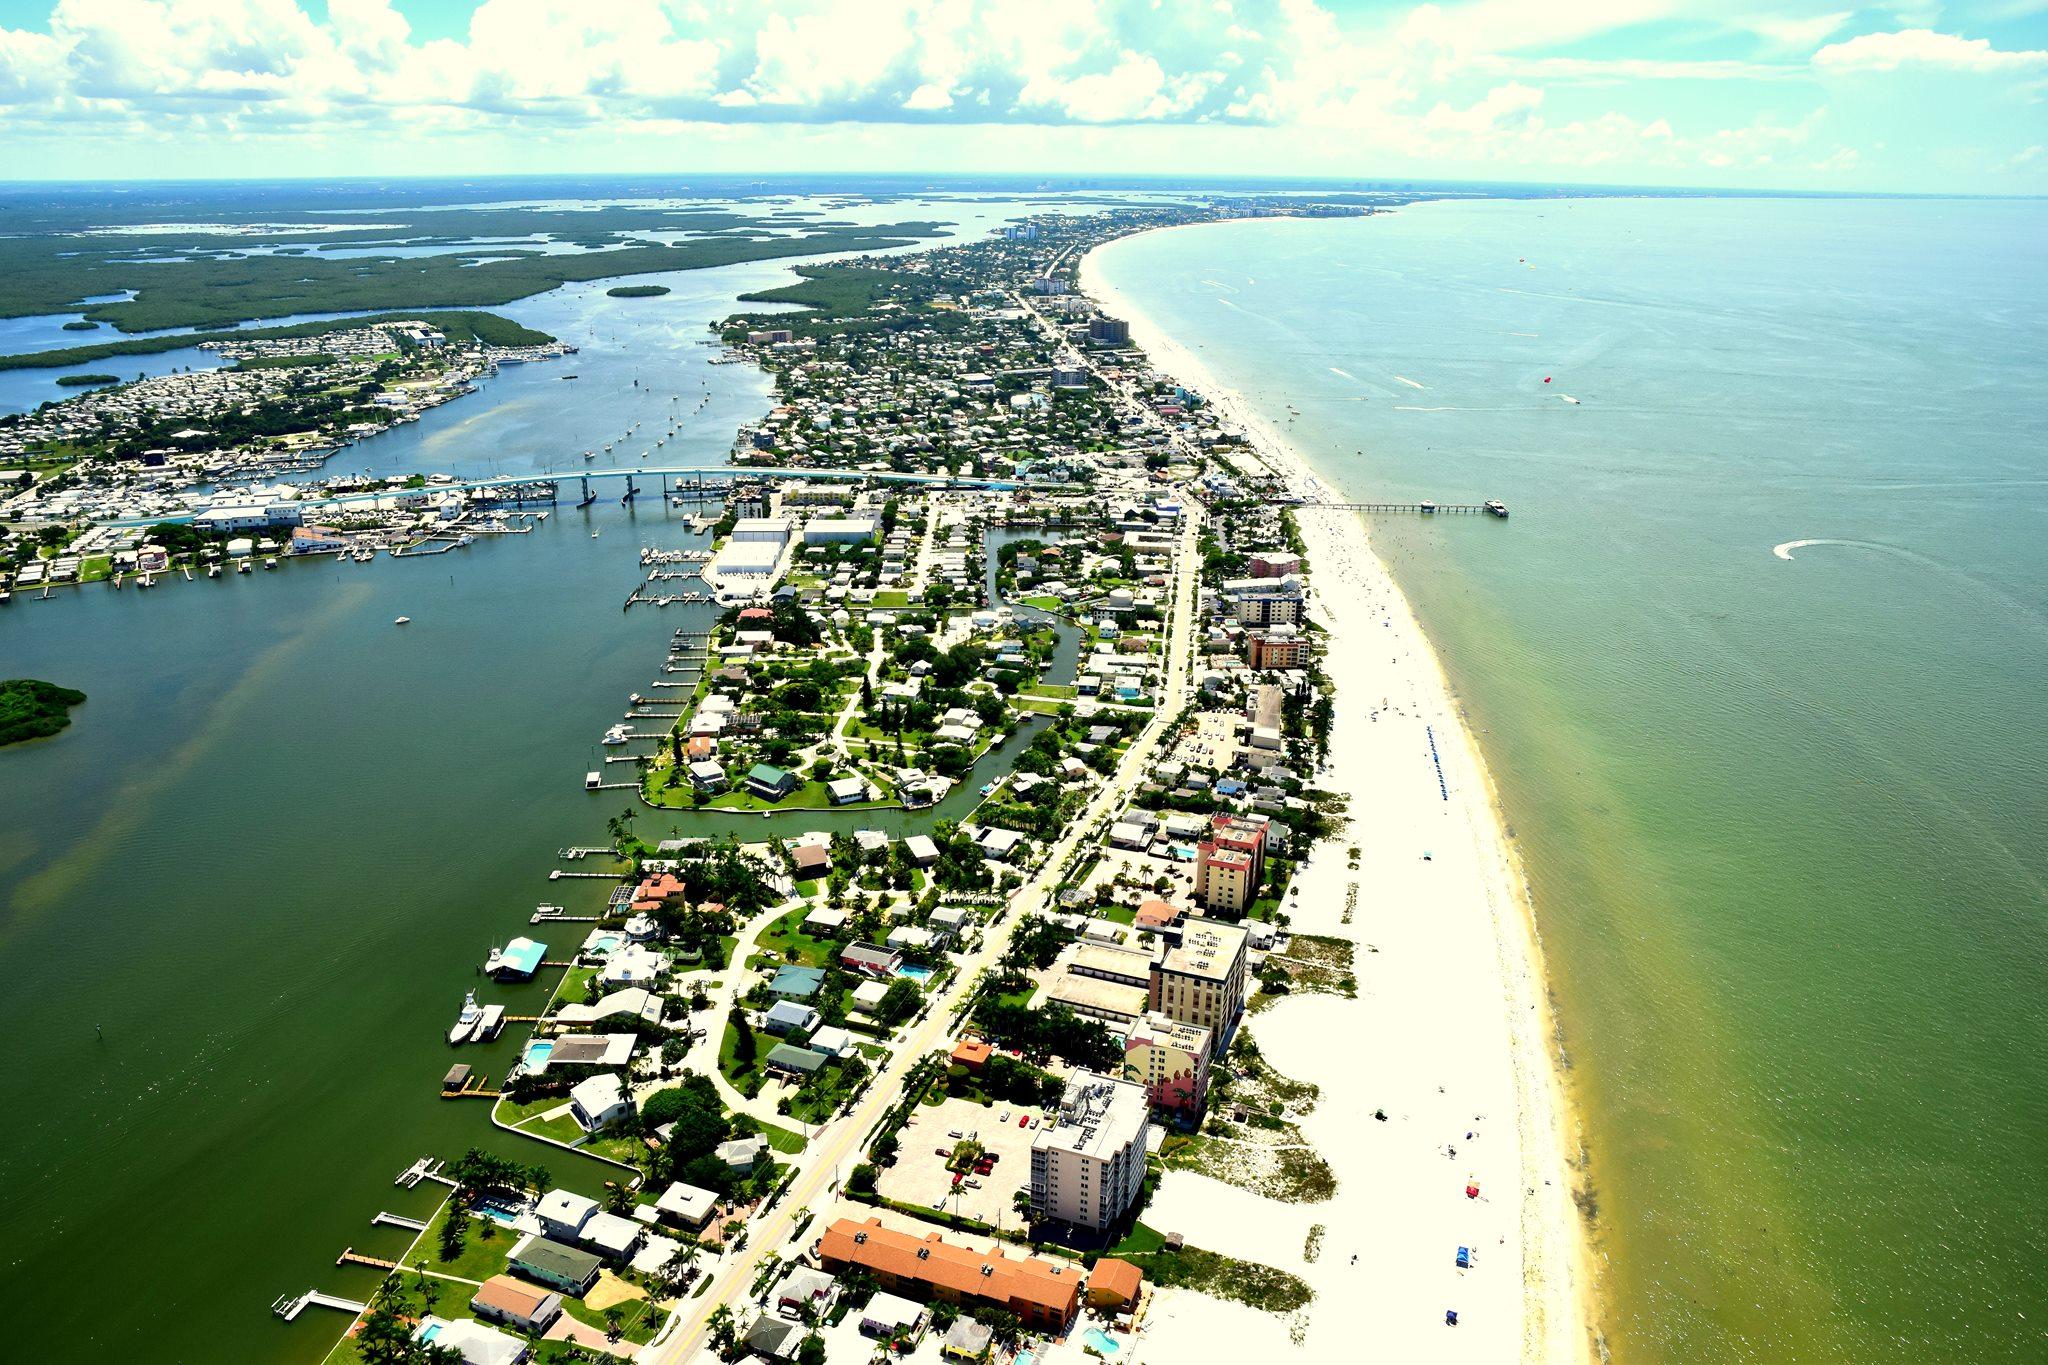 Florida Gulf Coast - Fort Myers Beach Area